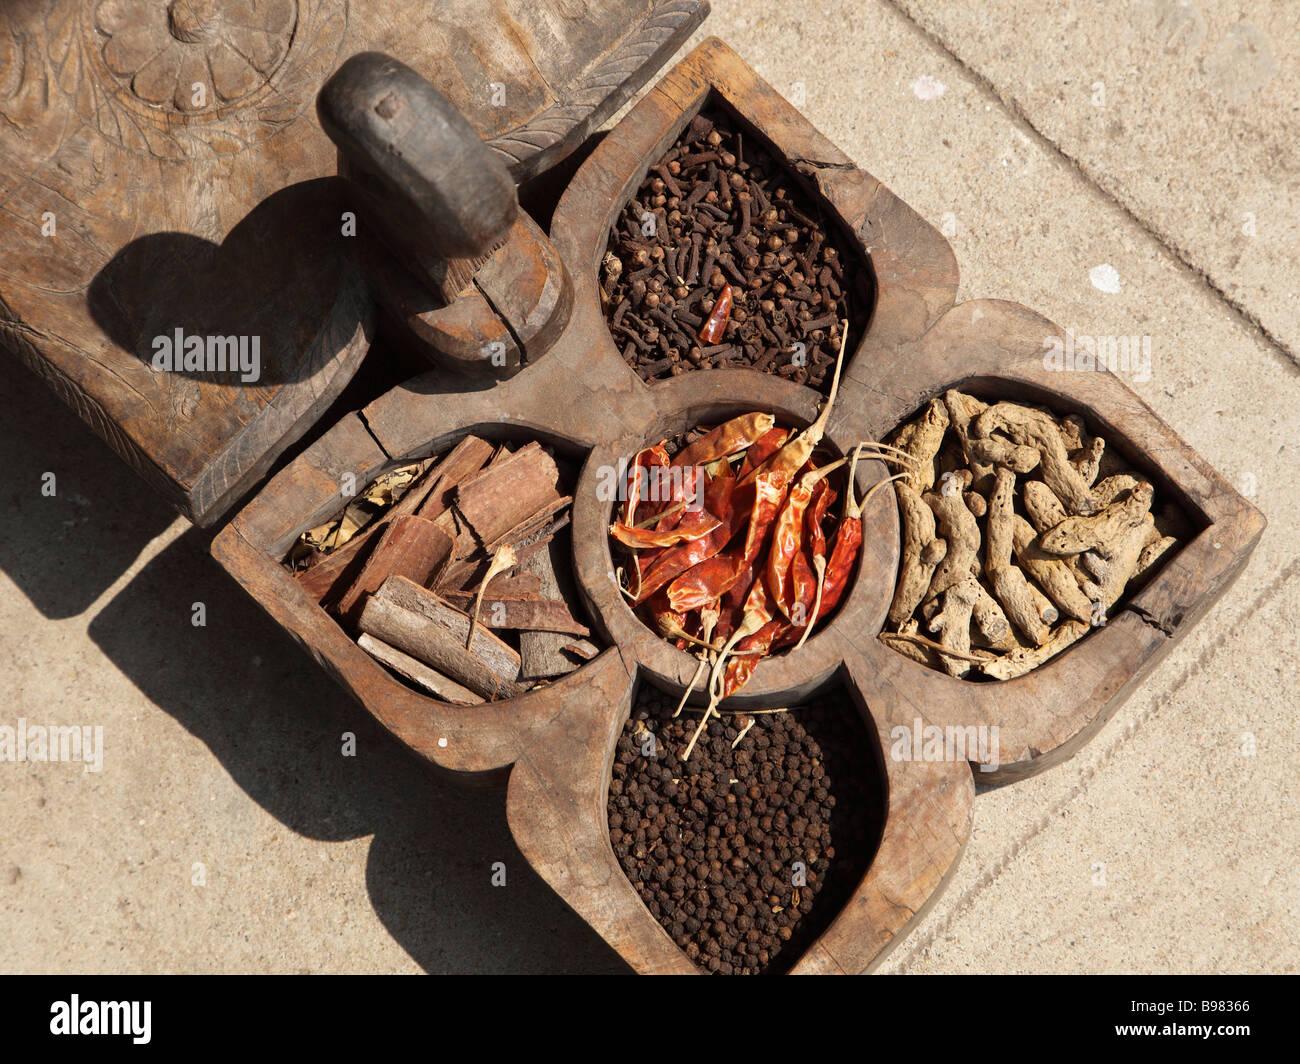 India Kerala Kochi Mattancherry Jew Town spice shop spices - Stock Image